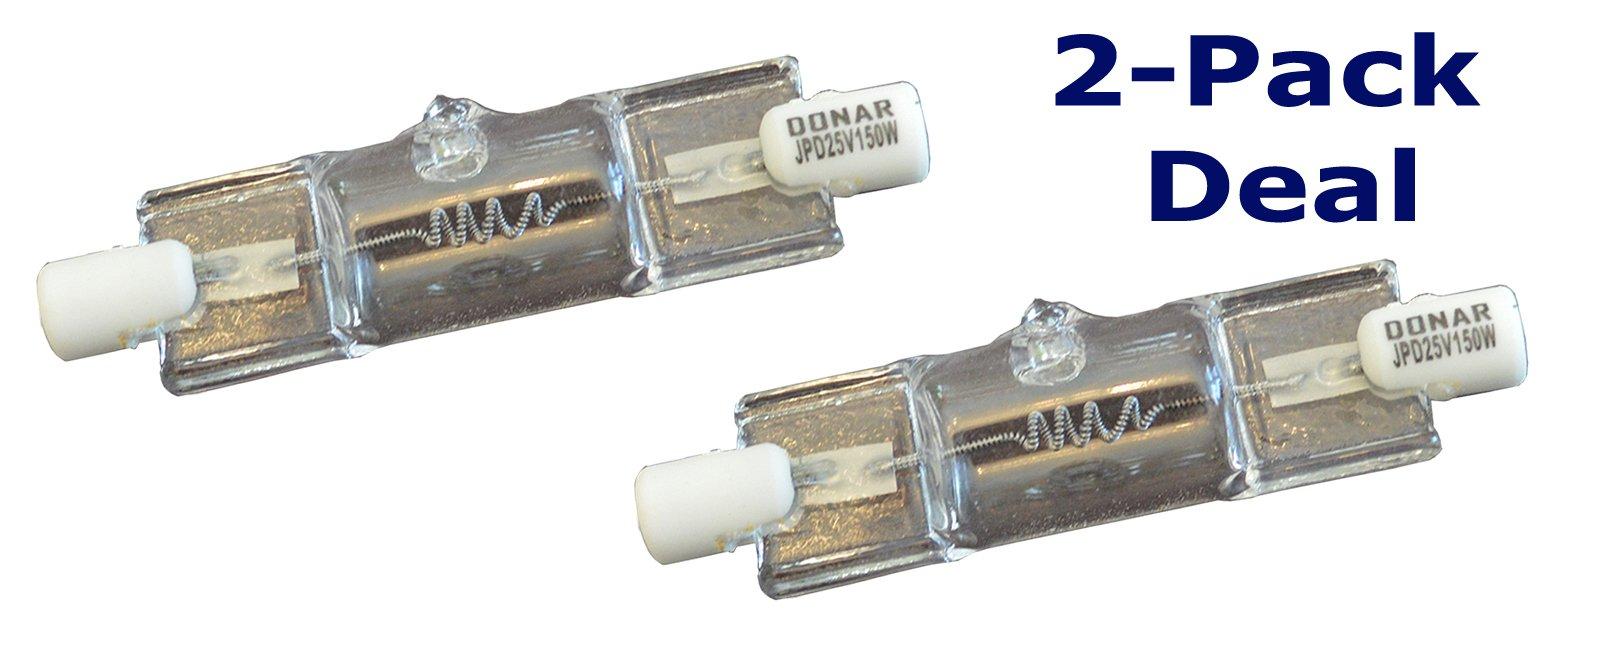 2pcs 25V 150W T4 RS-34 Bulb for LAITE LT-03062 - LIGHT BULB 000-0545 150T4/CL-25V - Light Fantastic Dental Chair - LIGHT SOURCE LS-16 JPD 25V 150W G1 LS-16-GE – OSRAM 58930 – LUMINESCENT LDL-4076